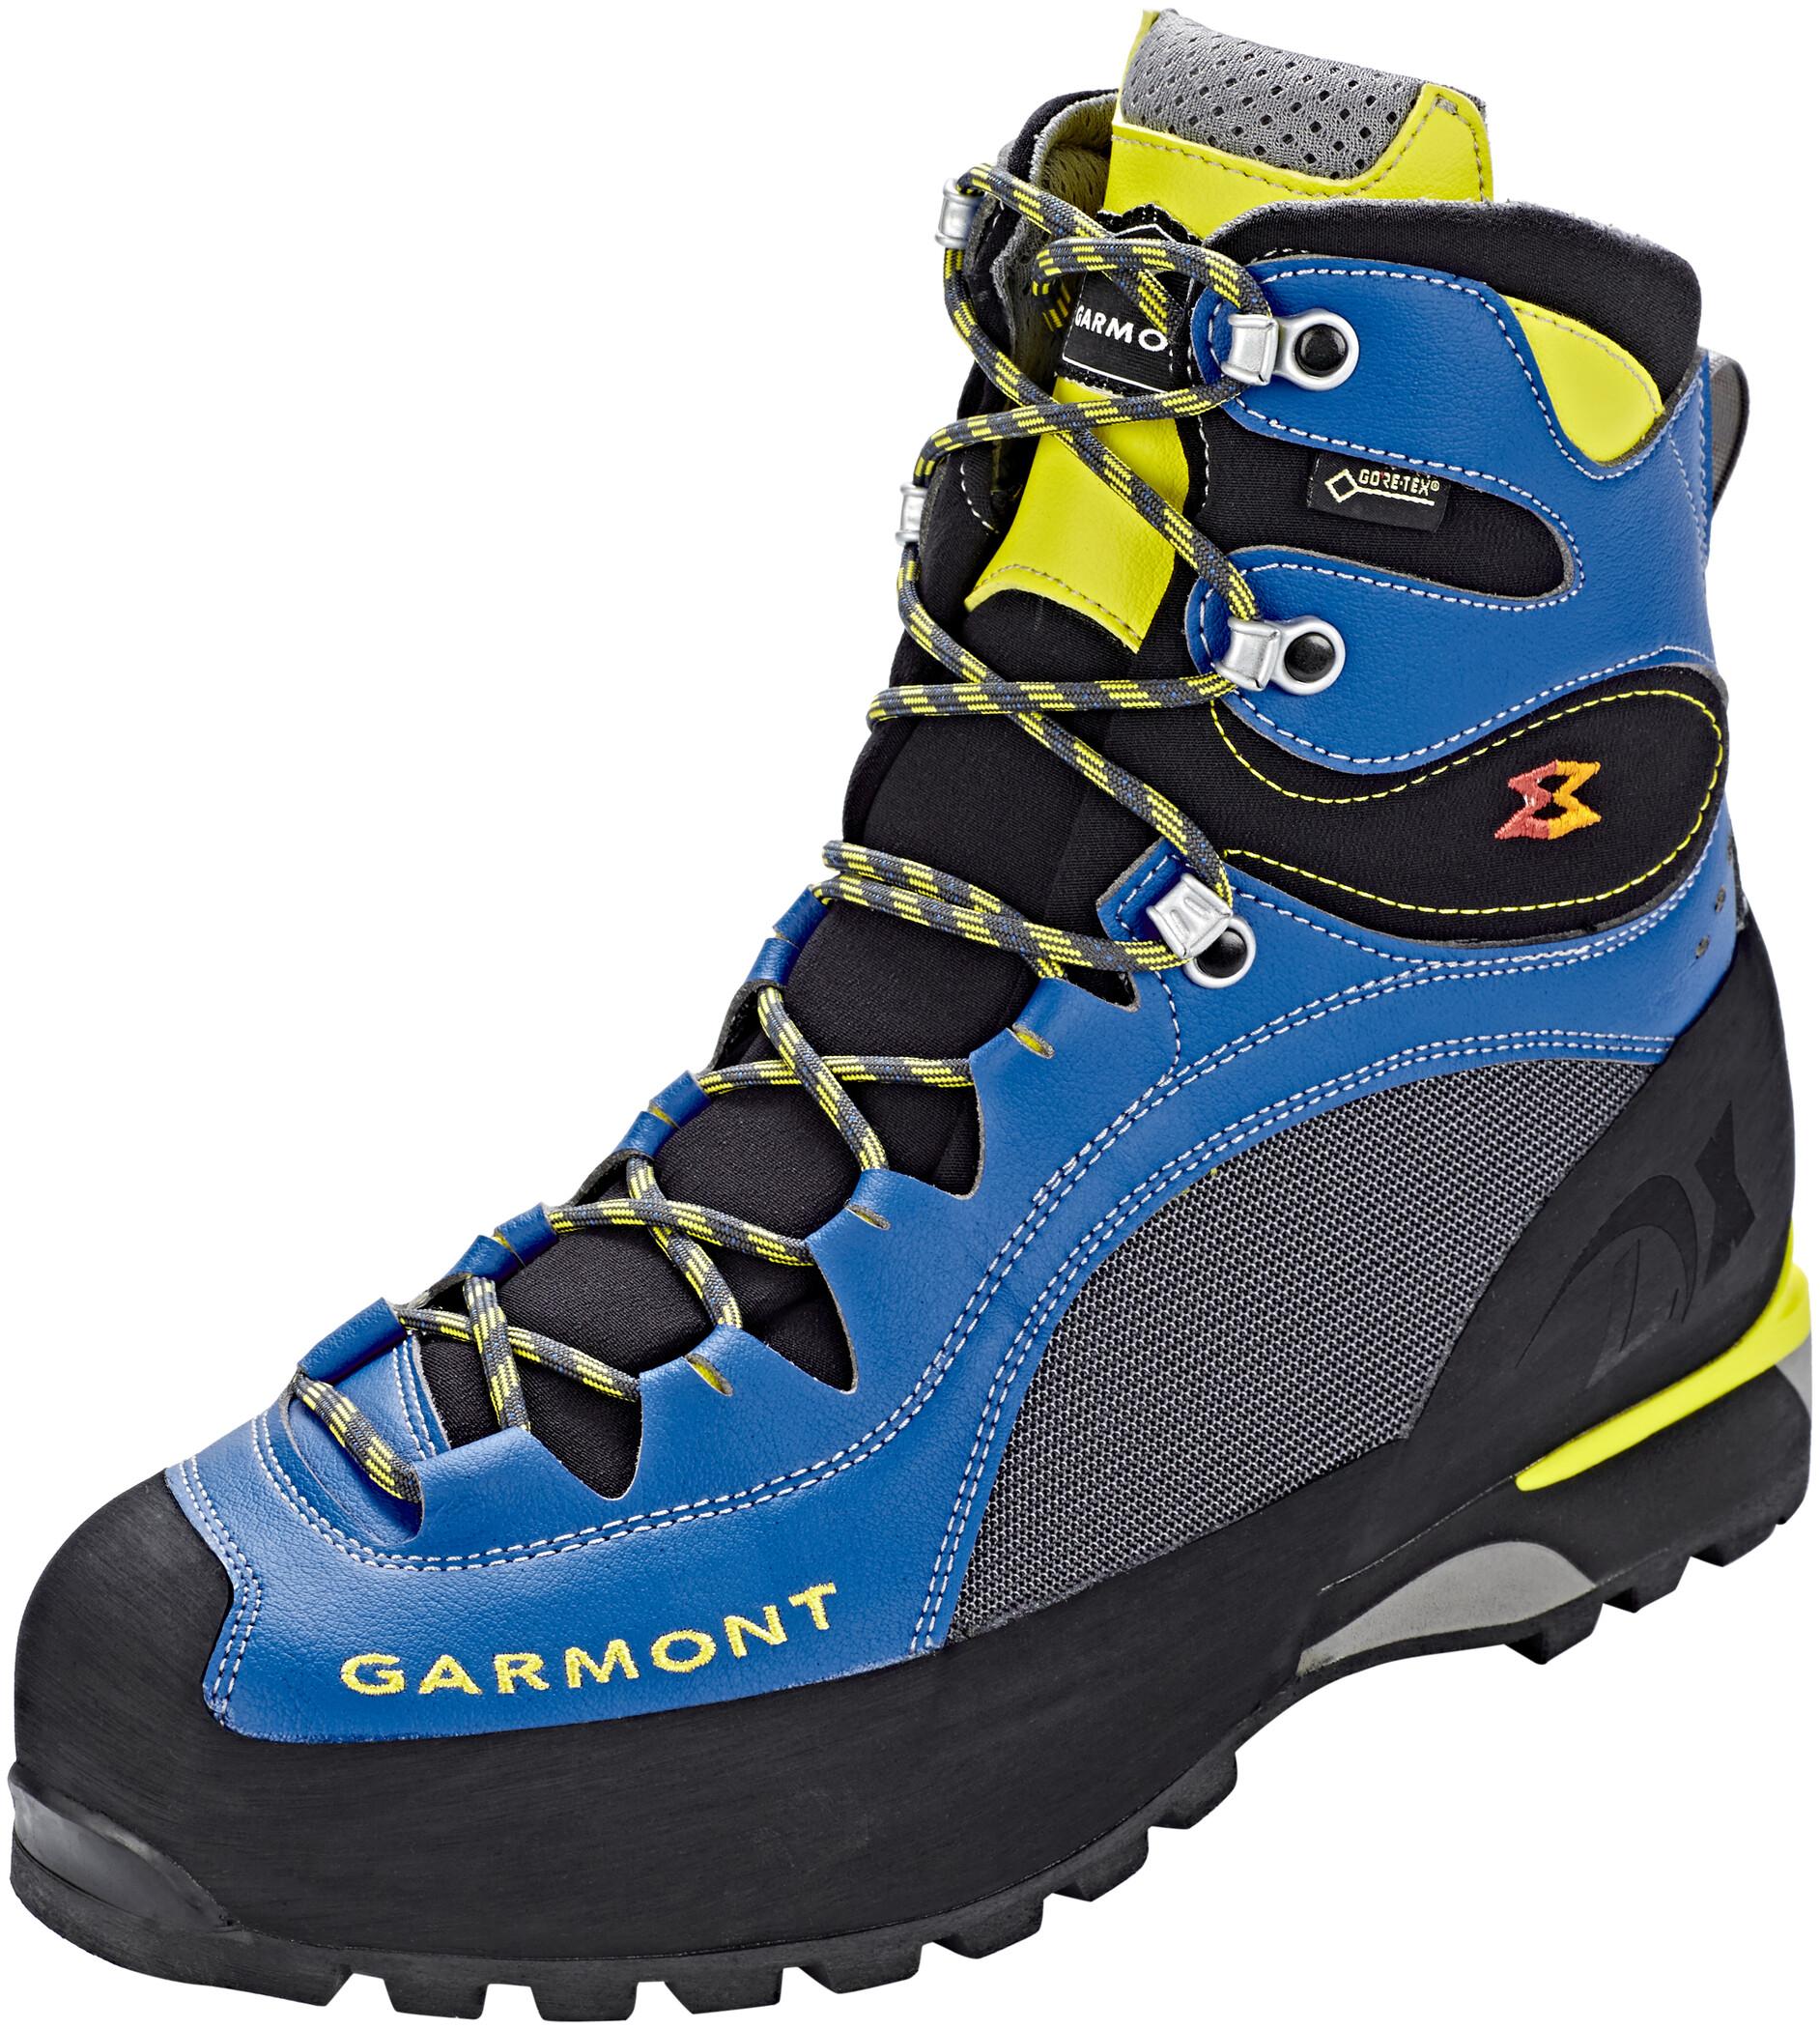 promo code 01b89 2f320 Garmont Tower LX GTX Shoes Men Aqua Blue Yellow.jpg